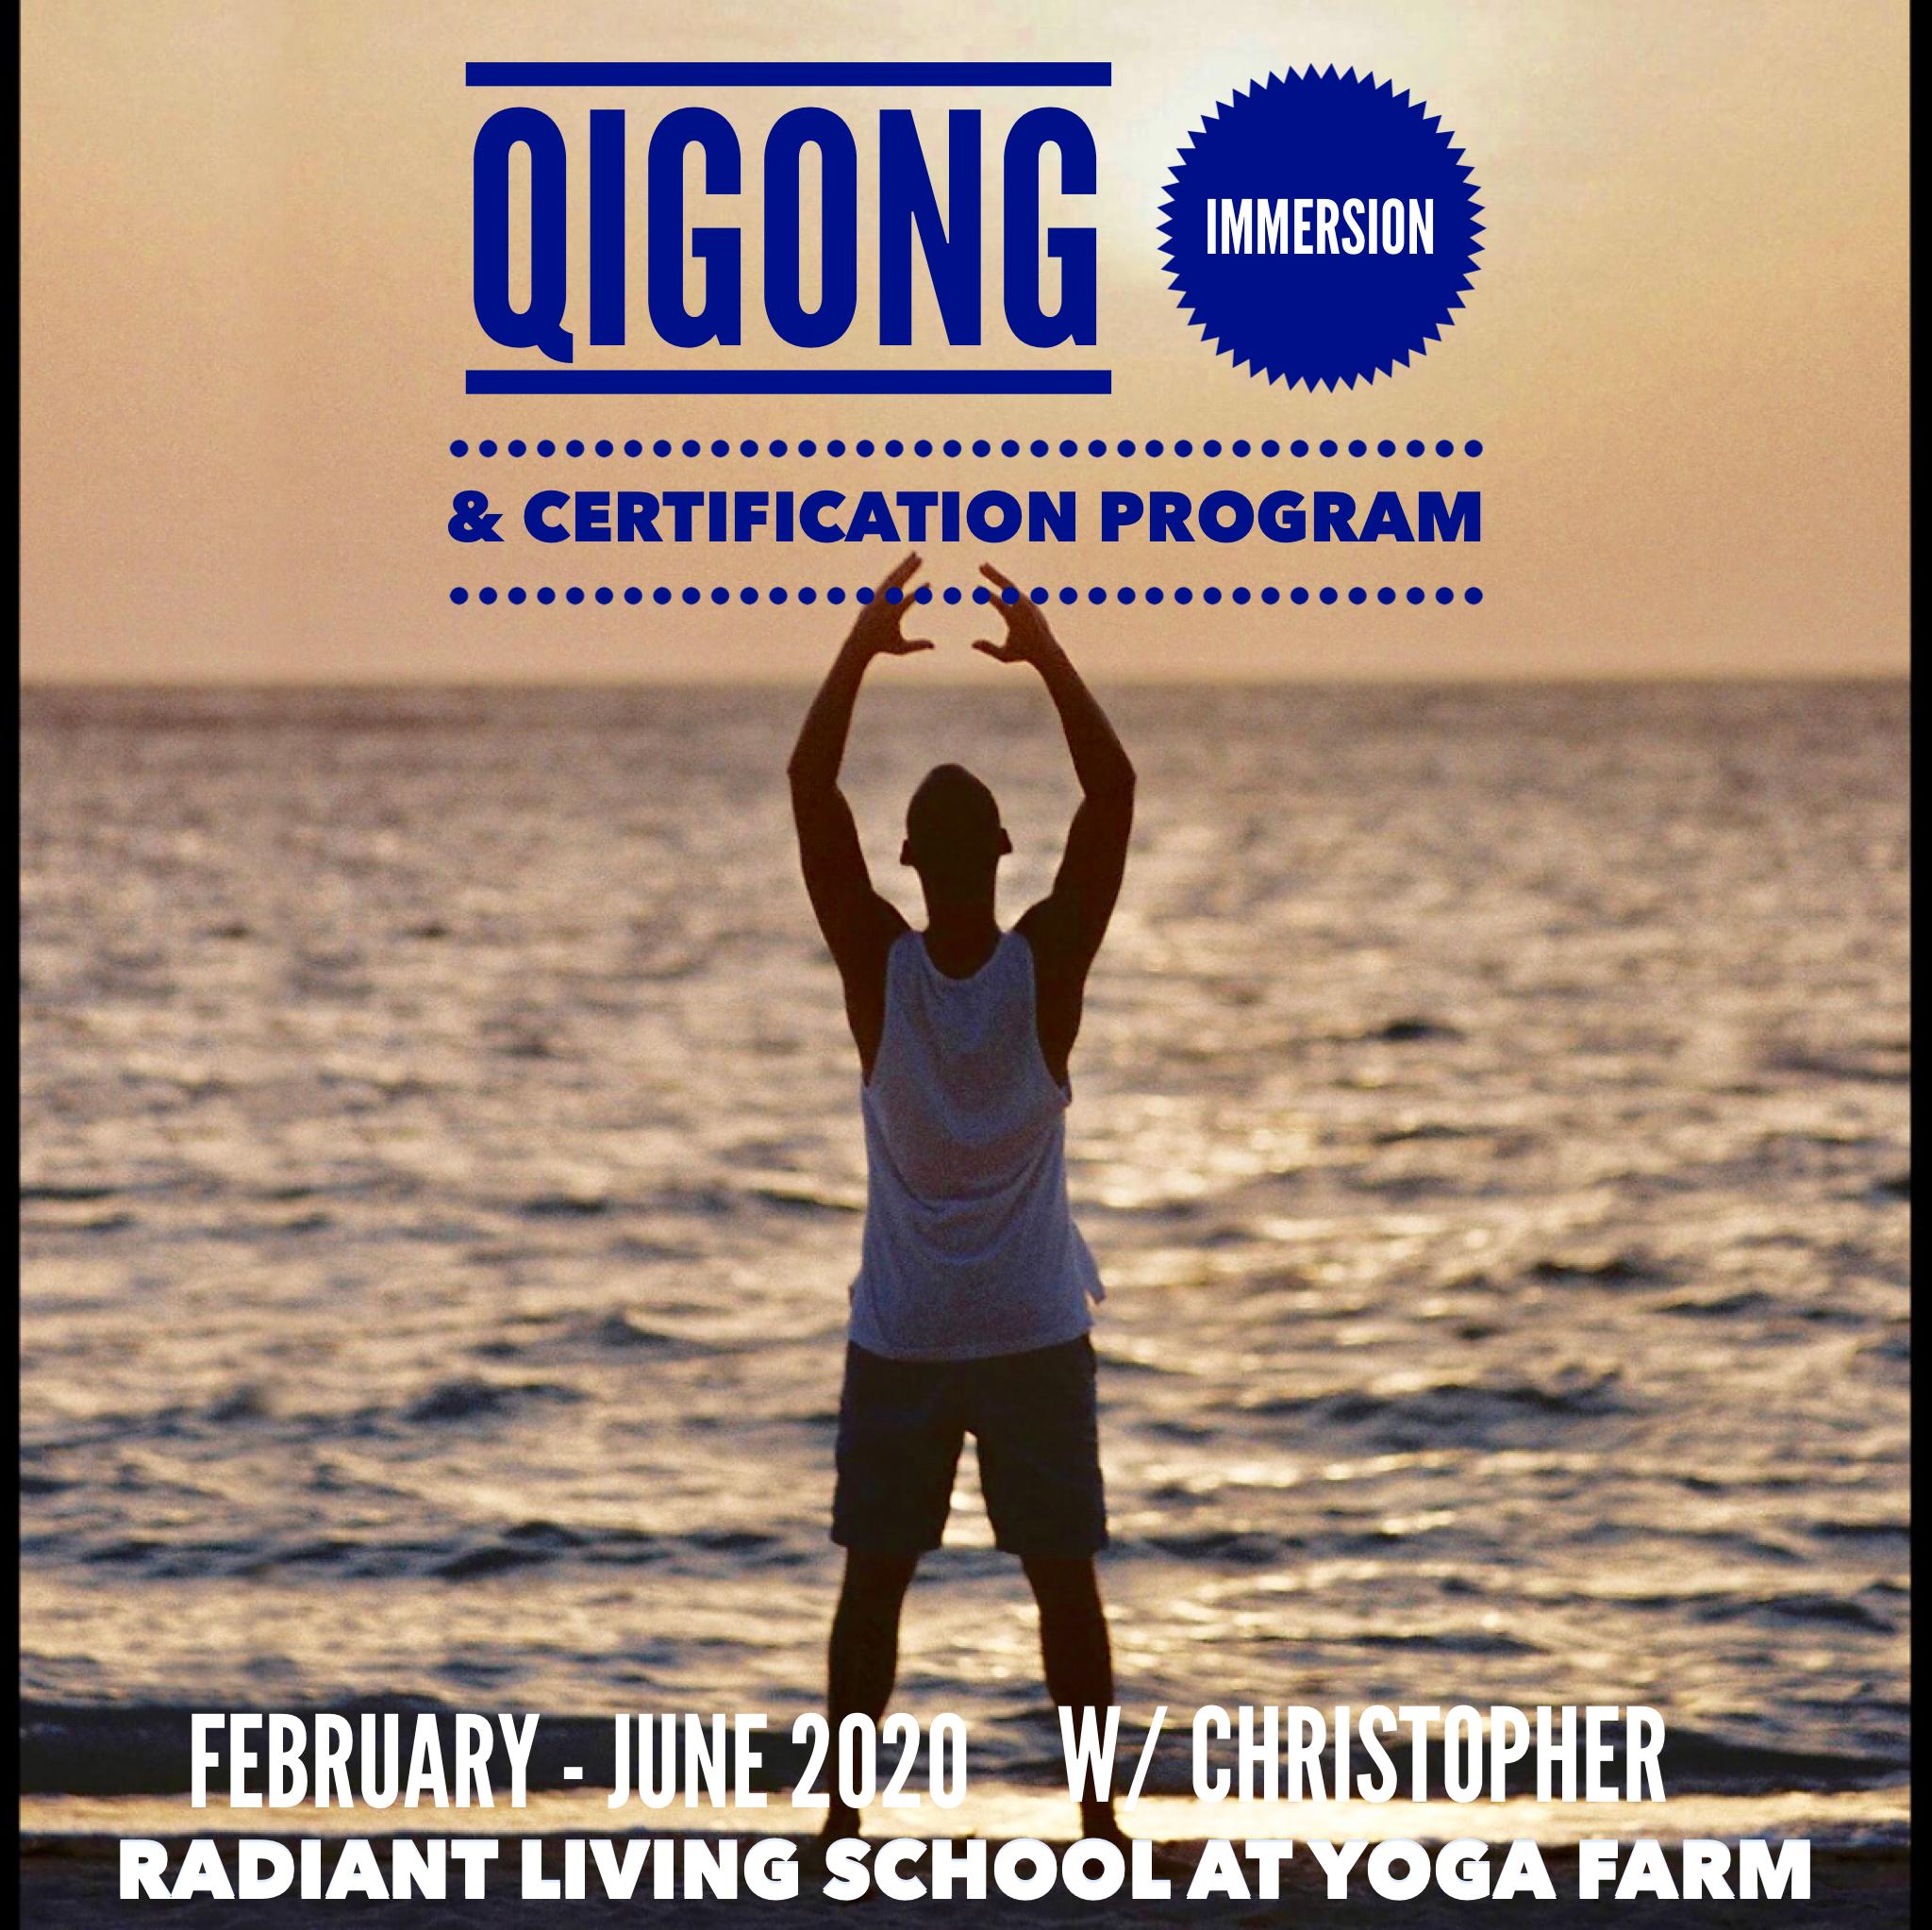 QiGonImmersionBoy.PNG